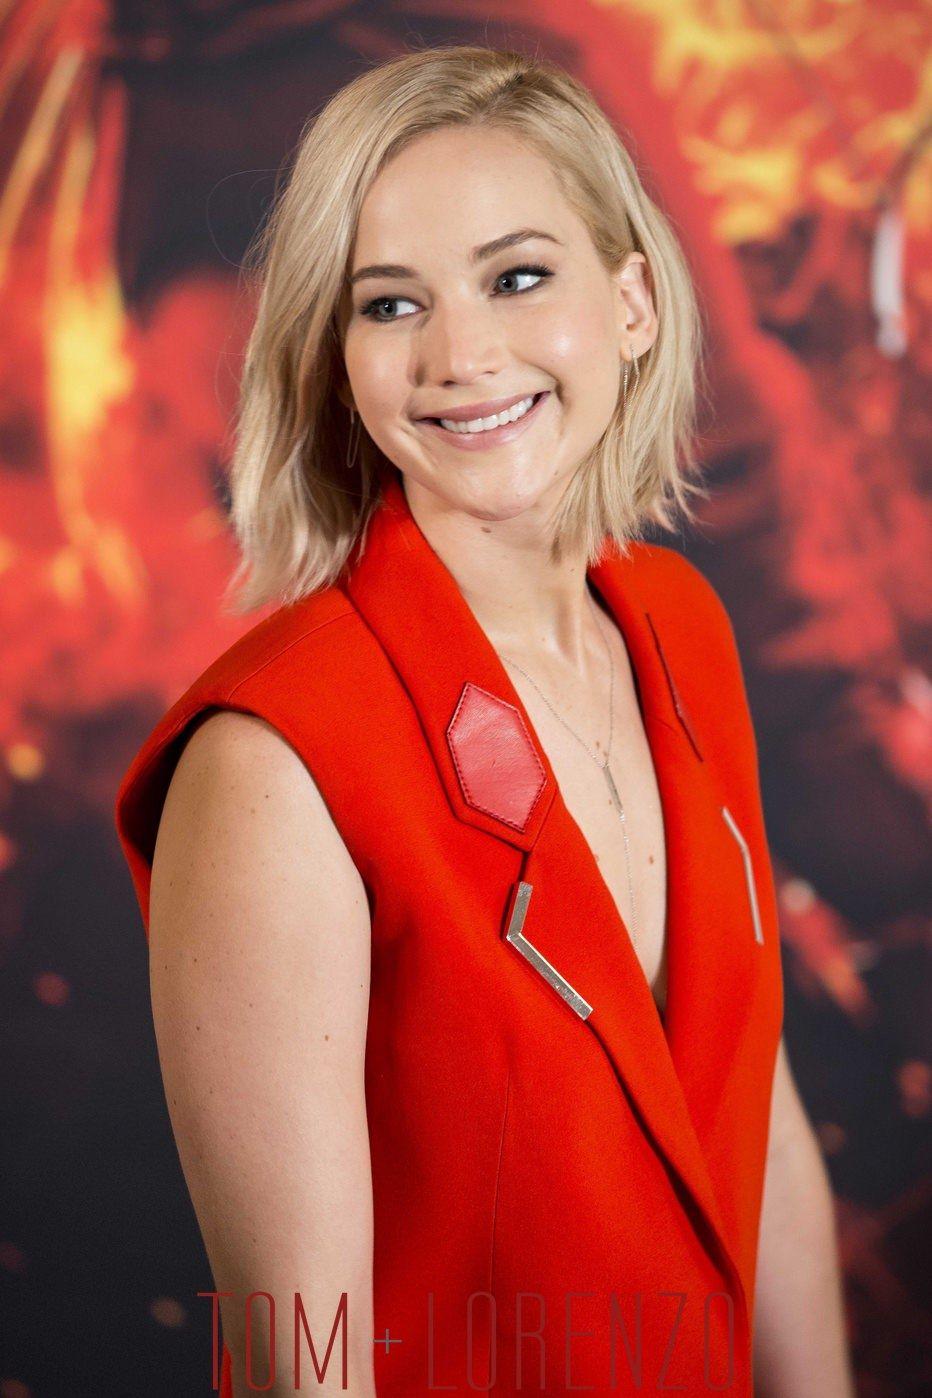 Jennifer-Lawrence-Mockingjay-Part-2-Madrid-Premiere-Photocall-Fashion-Ralph-Lauren-Mugler-Tom-Lorenzo-Site (1)